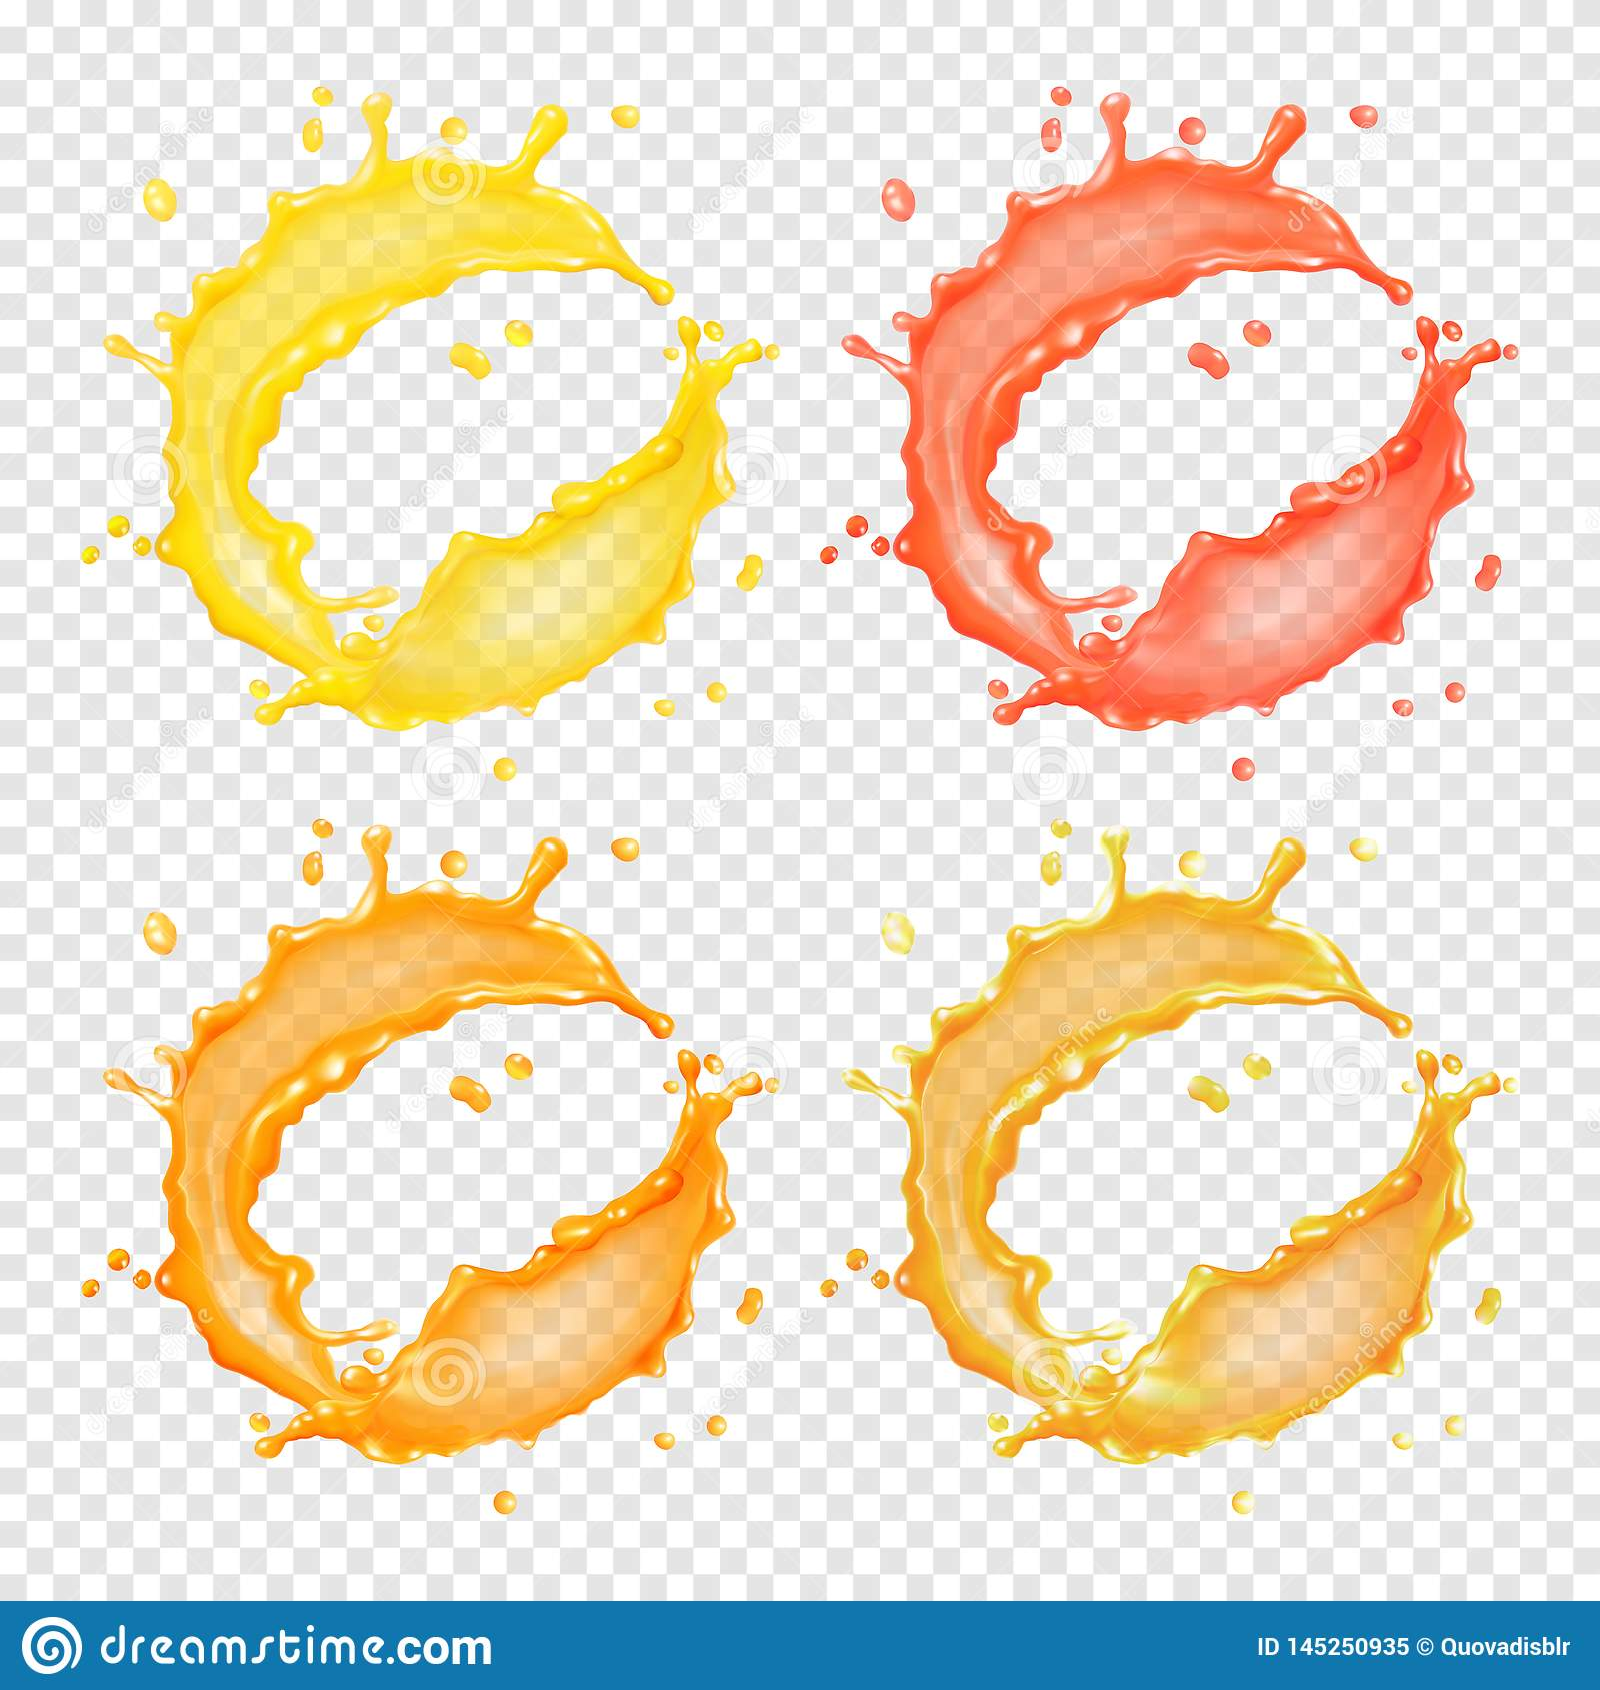 3d realistische transparante vector cirkelplons van vloeistof, sap, thee, olie of verf